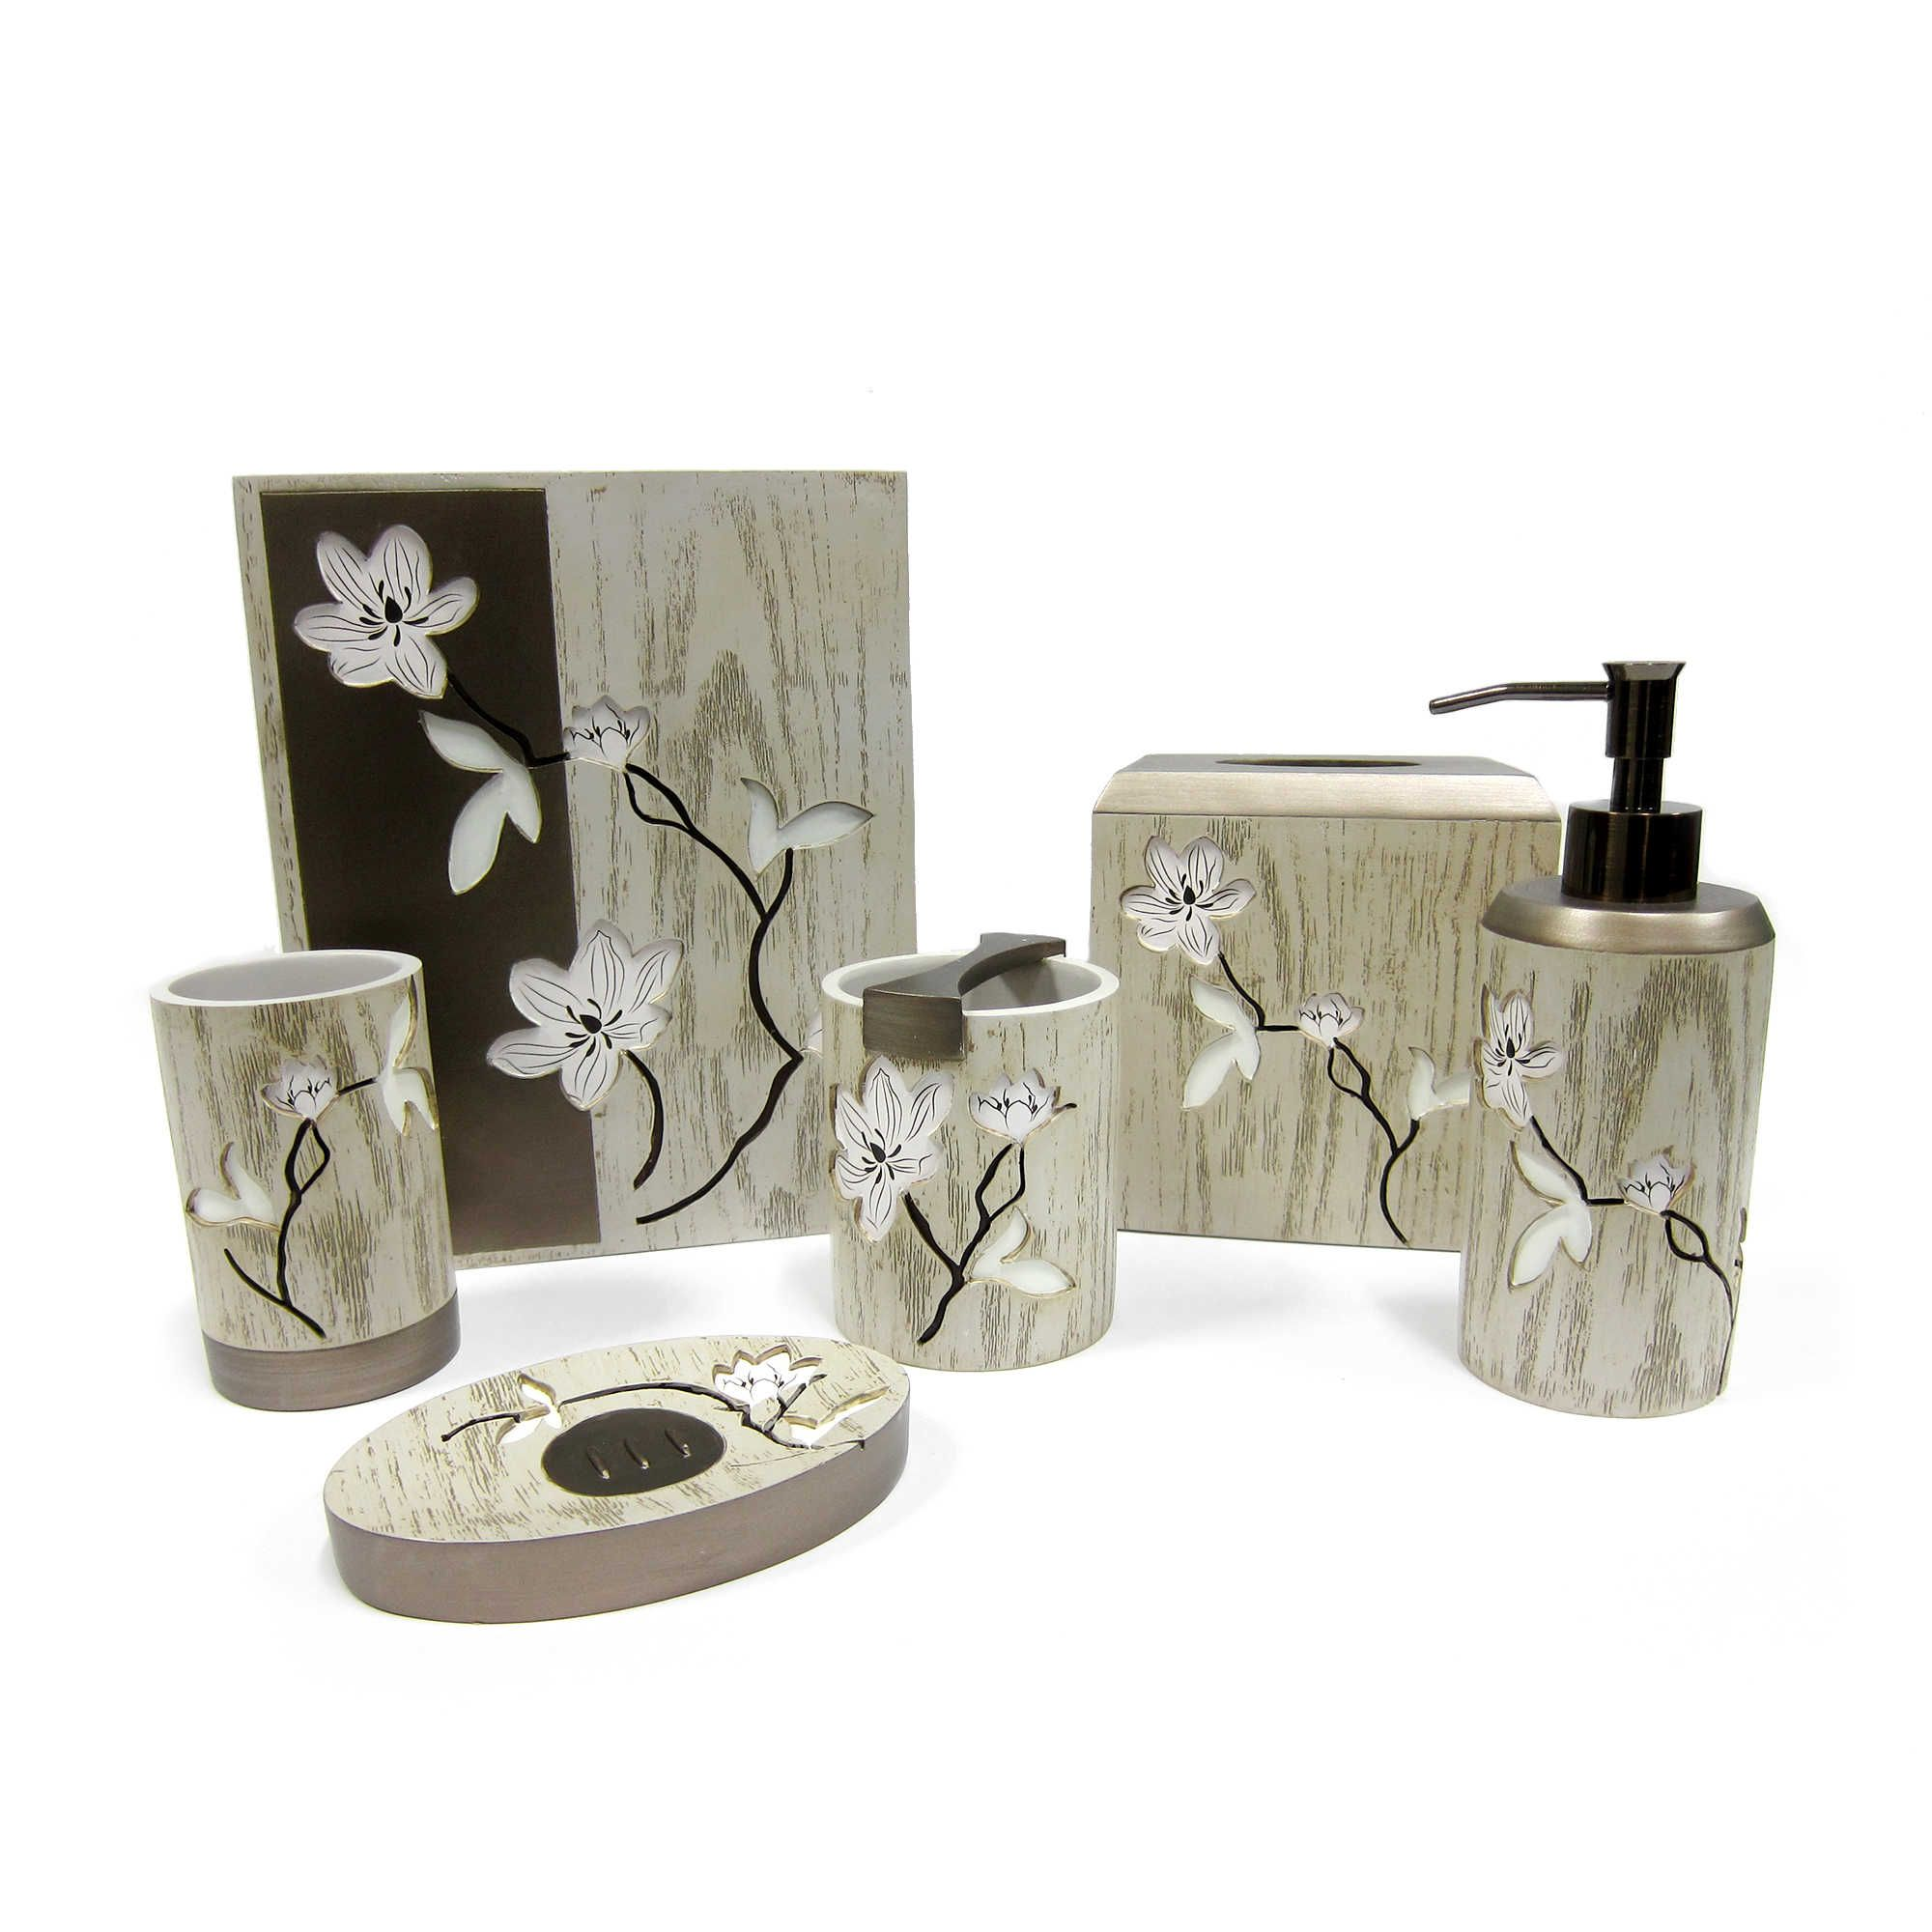 Croscill® Magnolia Floral Bath Ensemble | Products, Love and Magnolias